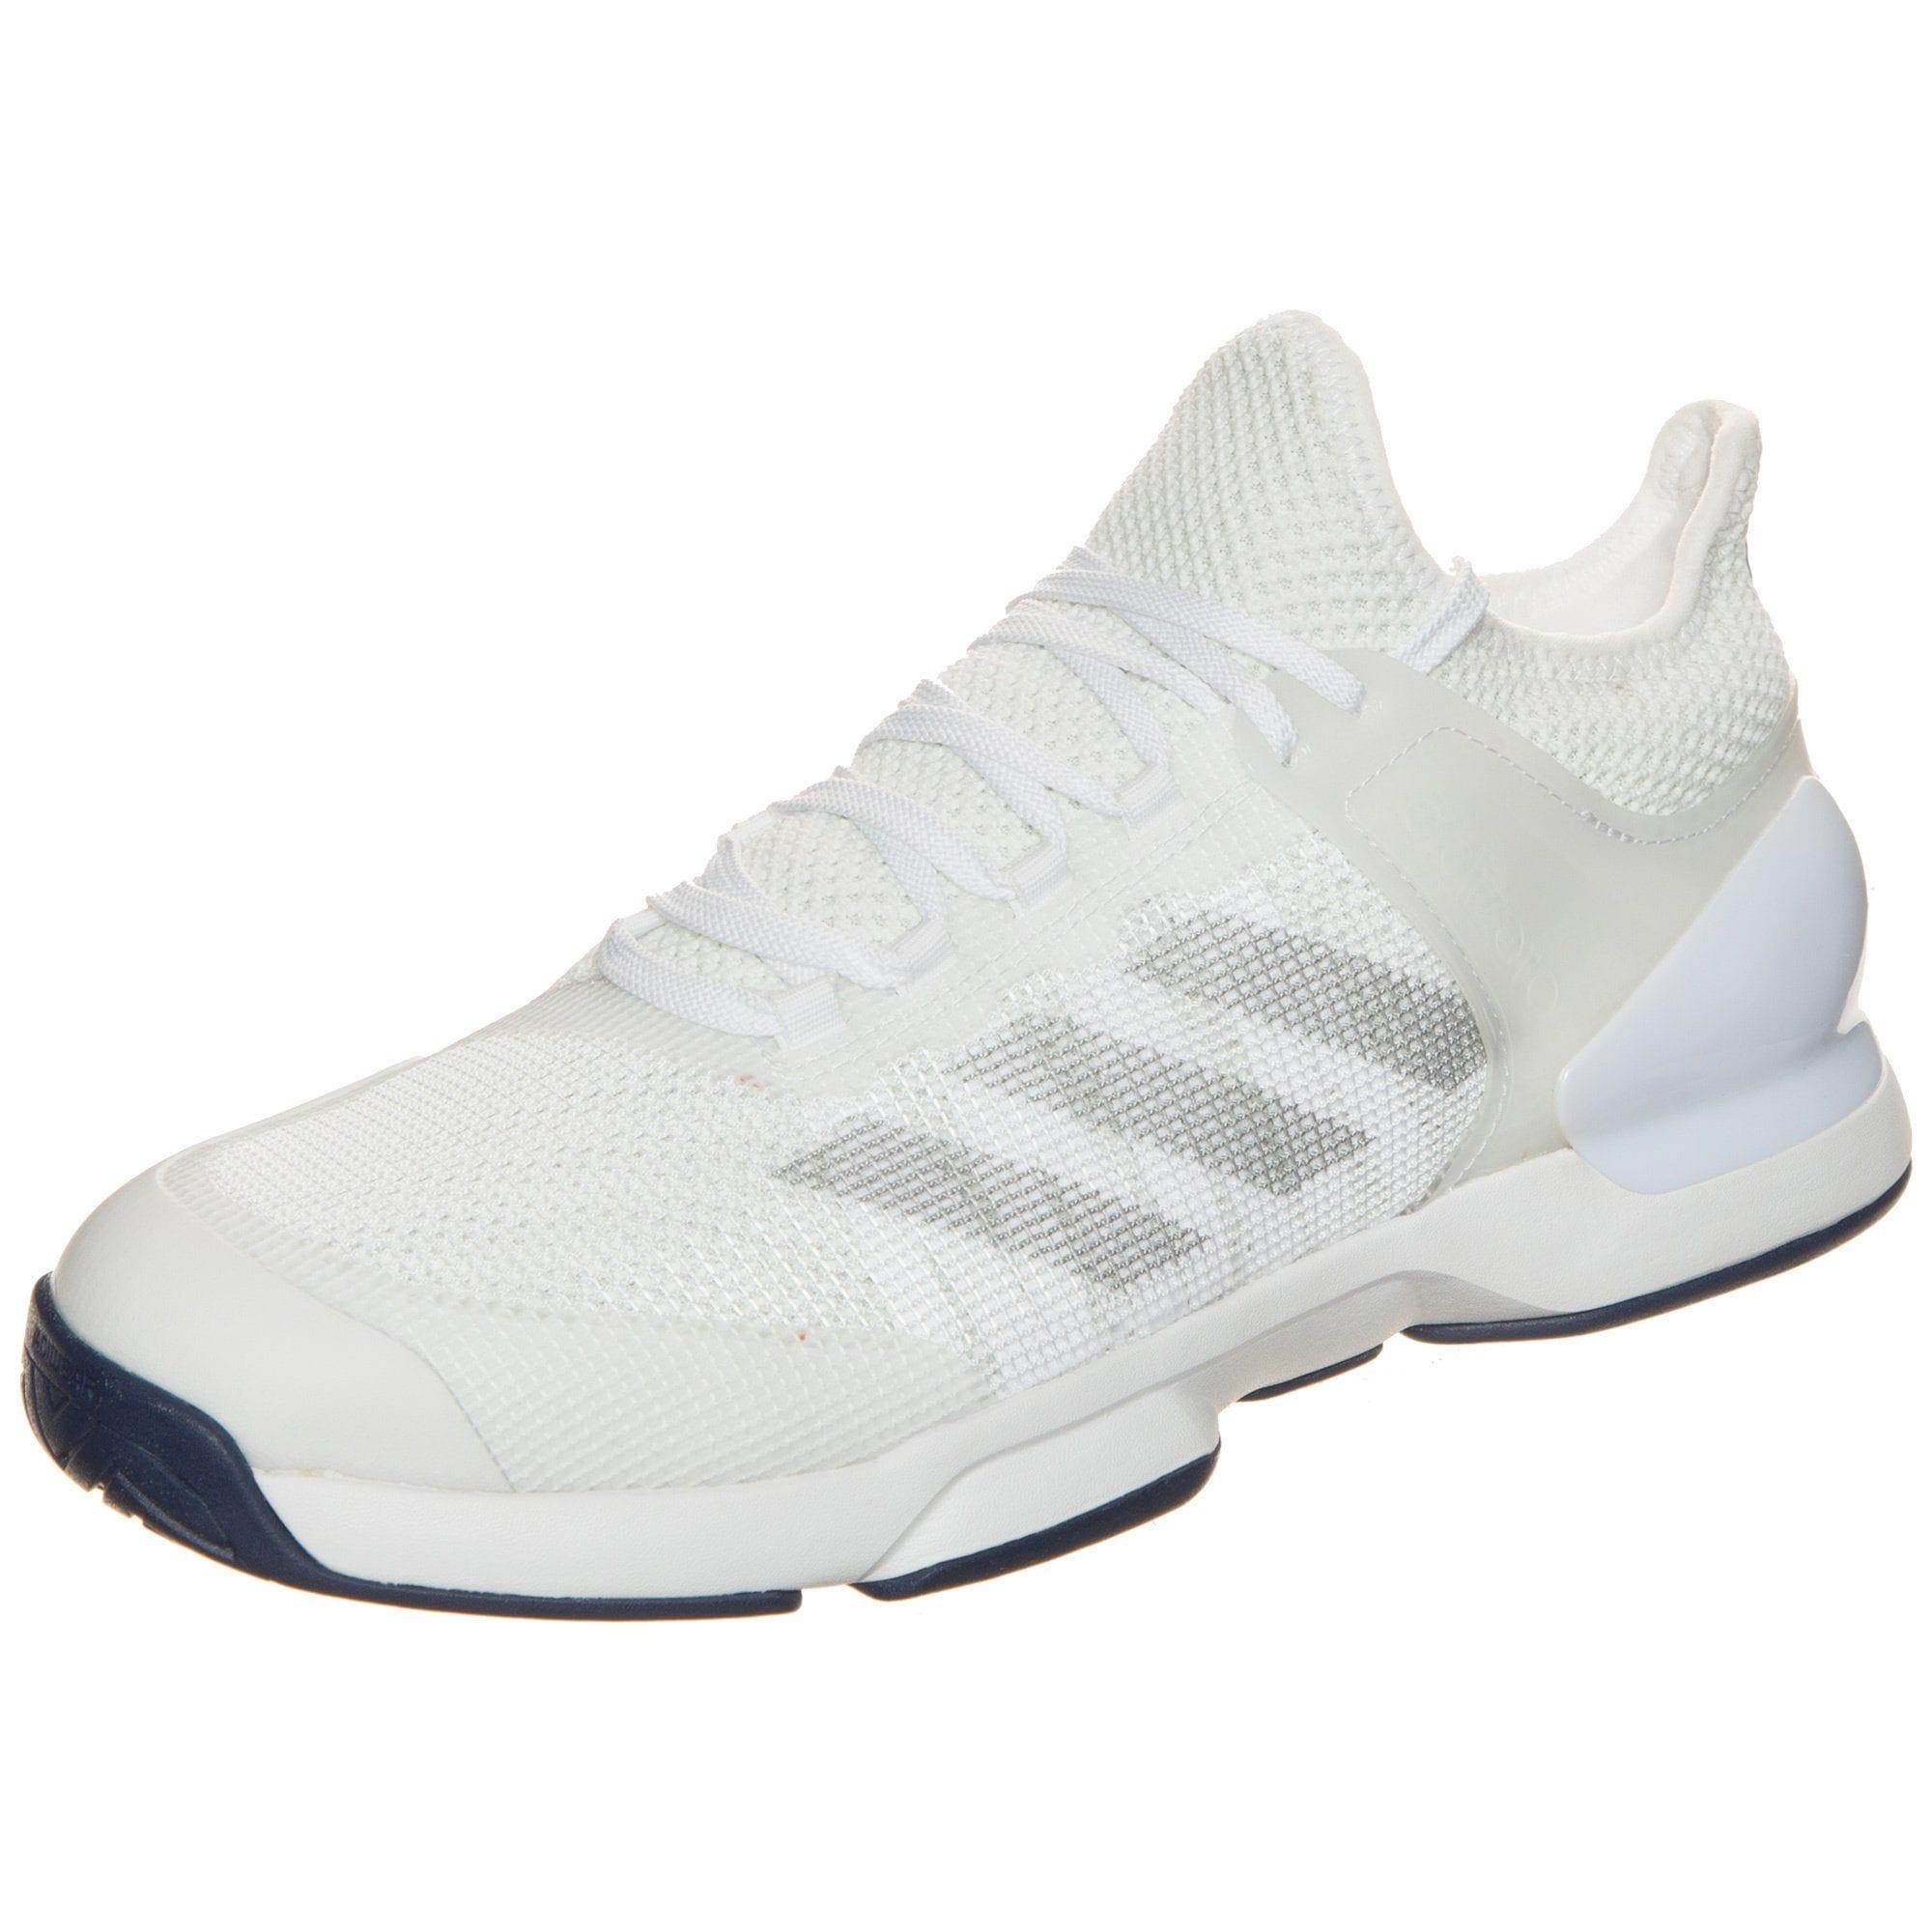 adidas Performance adizero Ubersonic 2 Tennisschuh Herren online bestellen  | BAUR